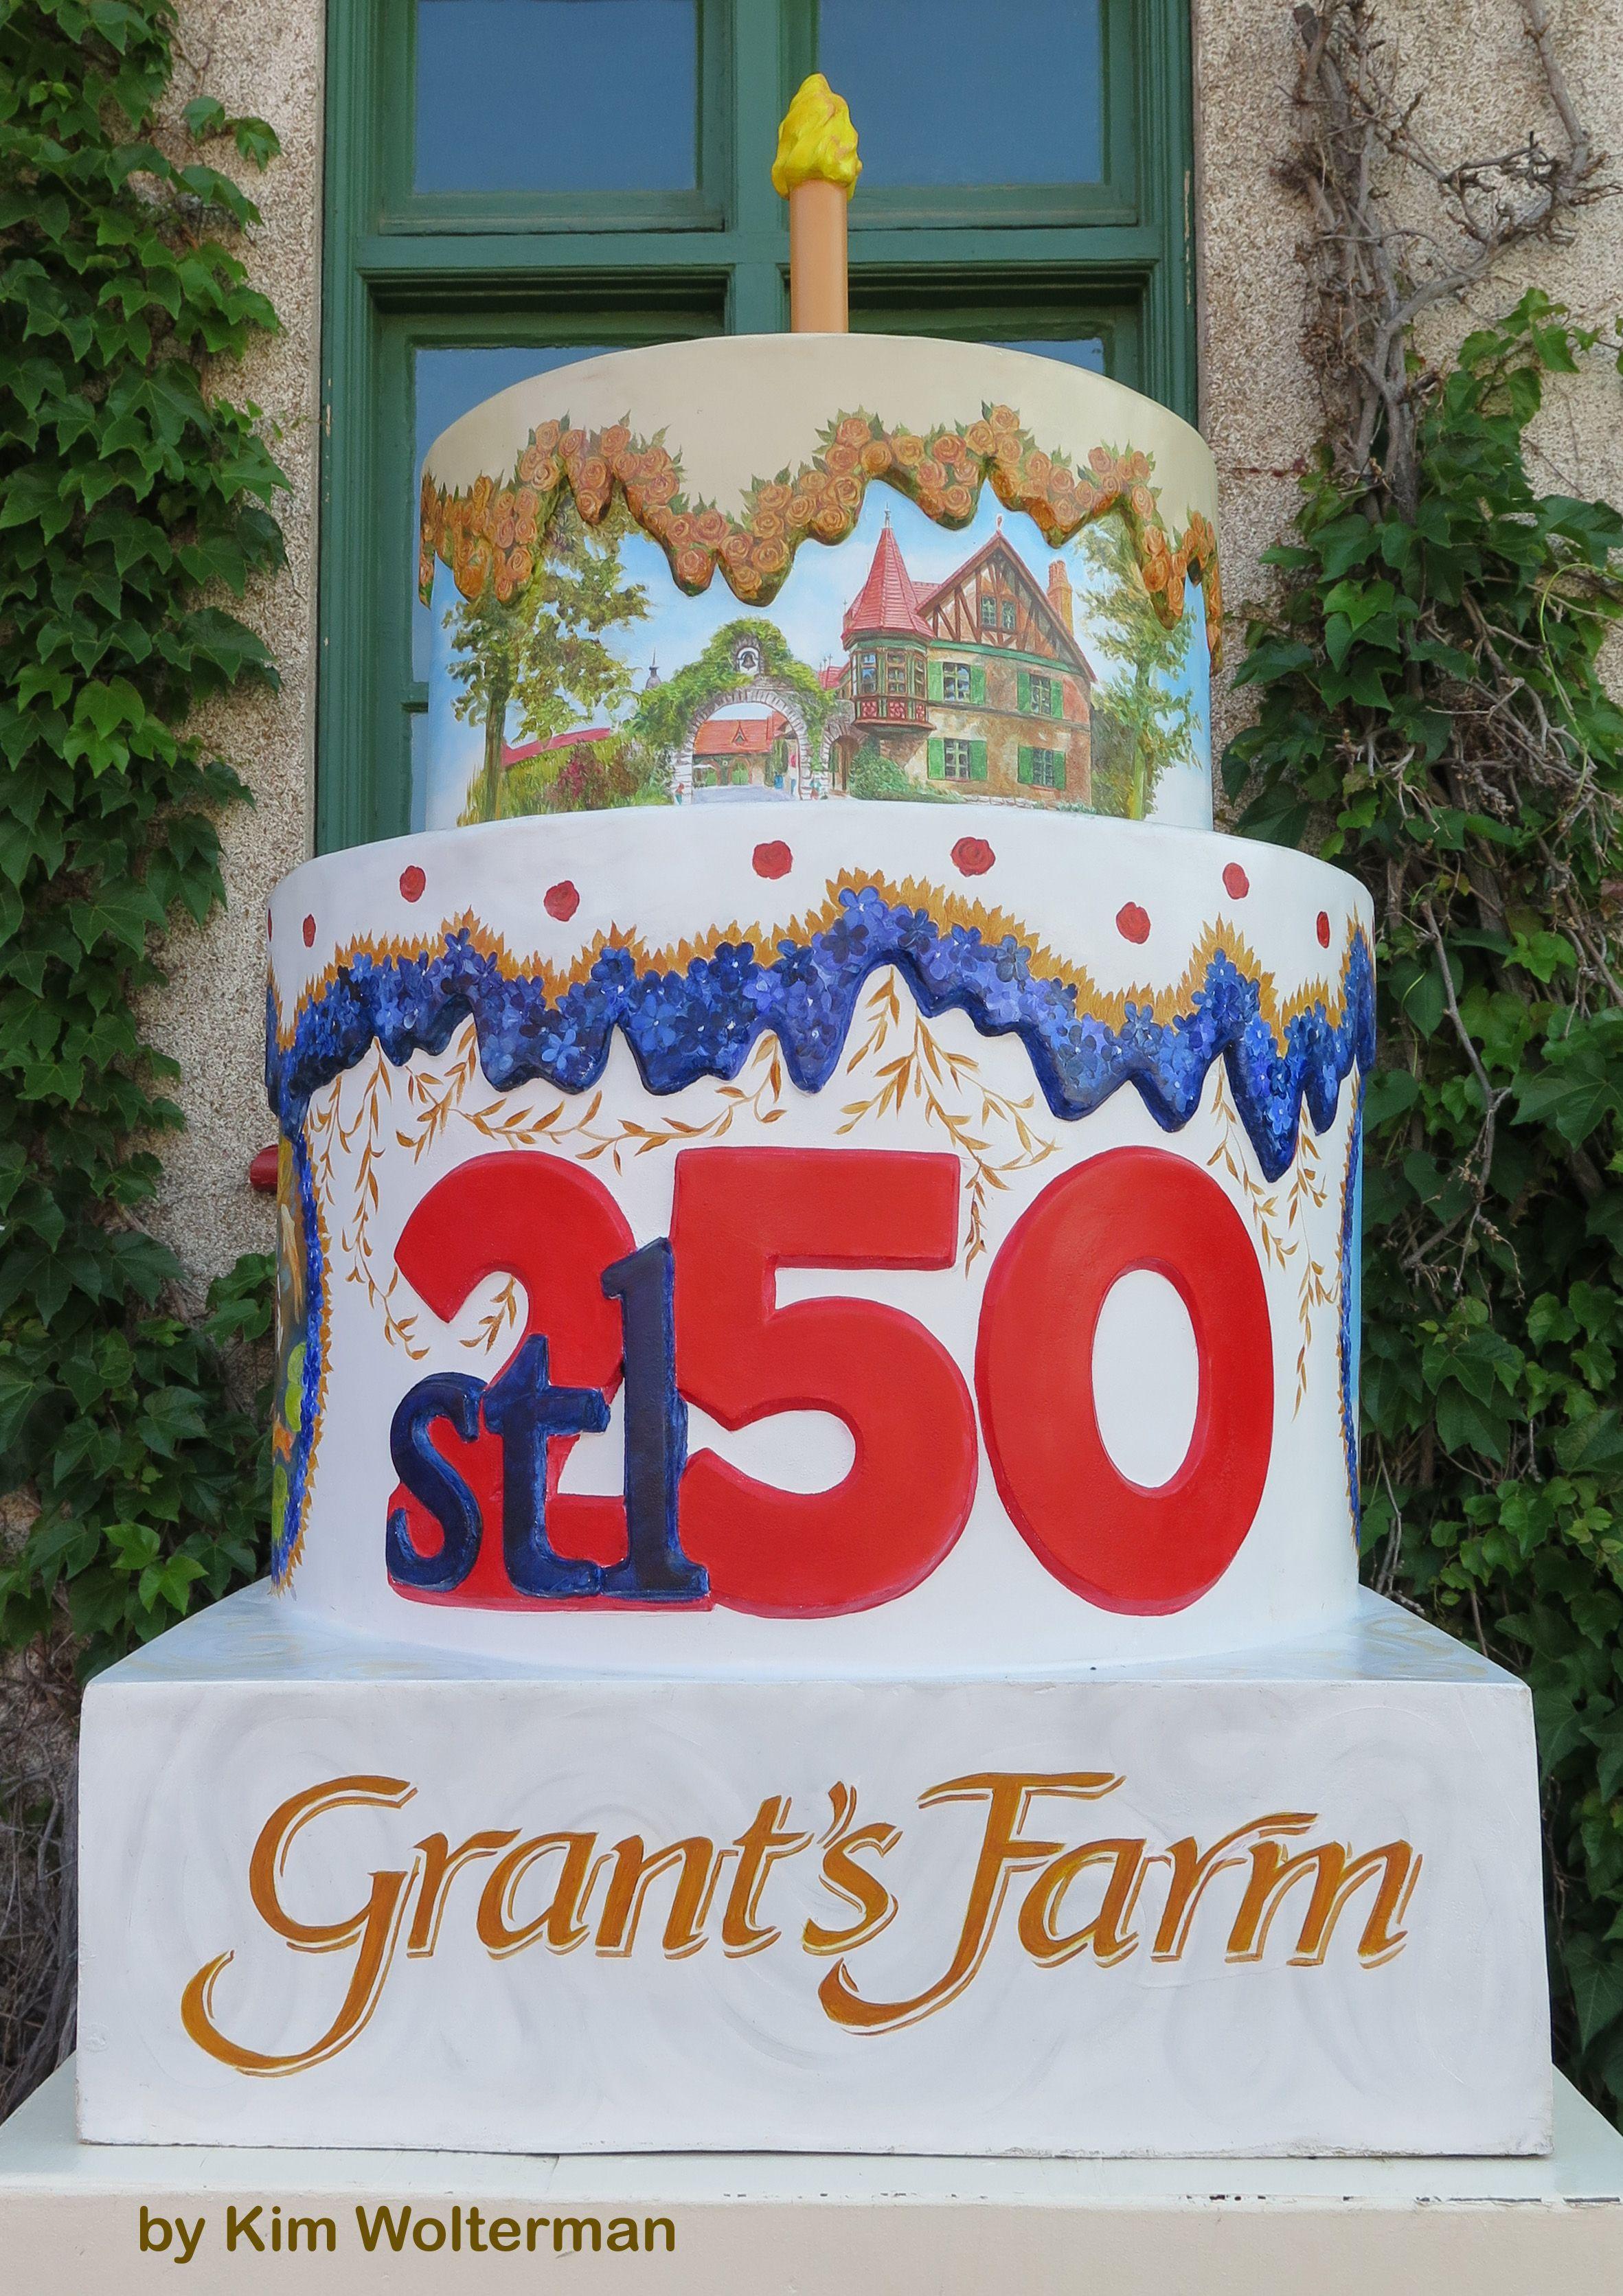 Cakeway to the West - Grant's Farm view 1 #cakewaytothewest #stl250